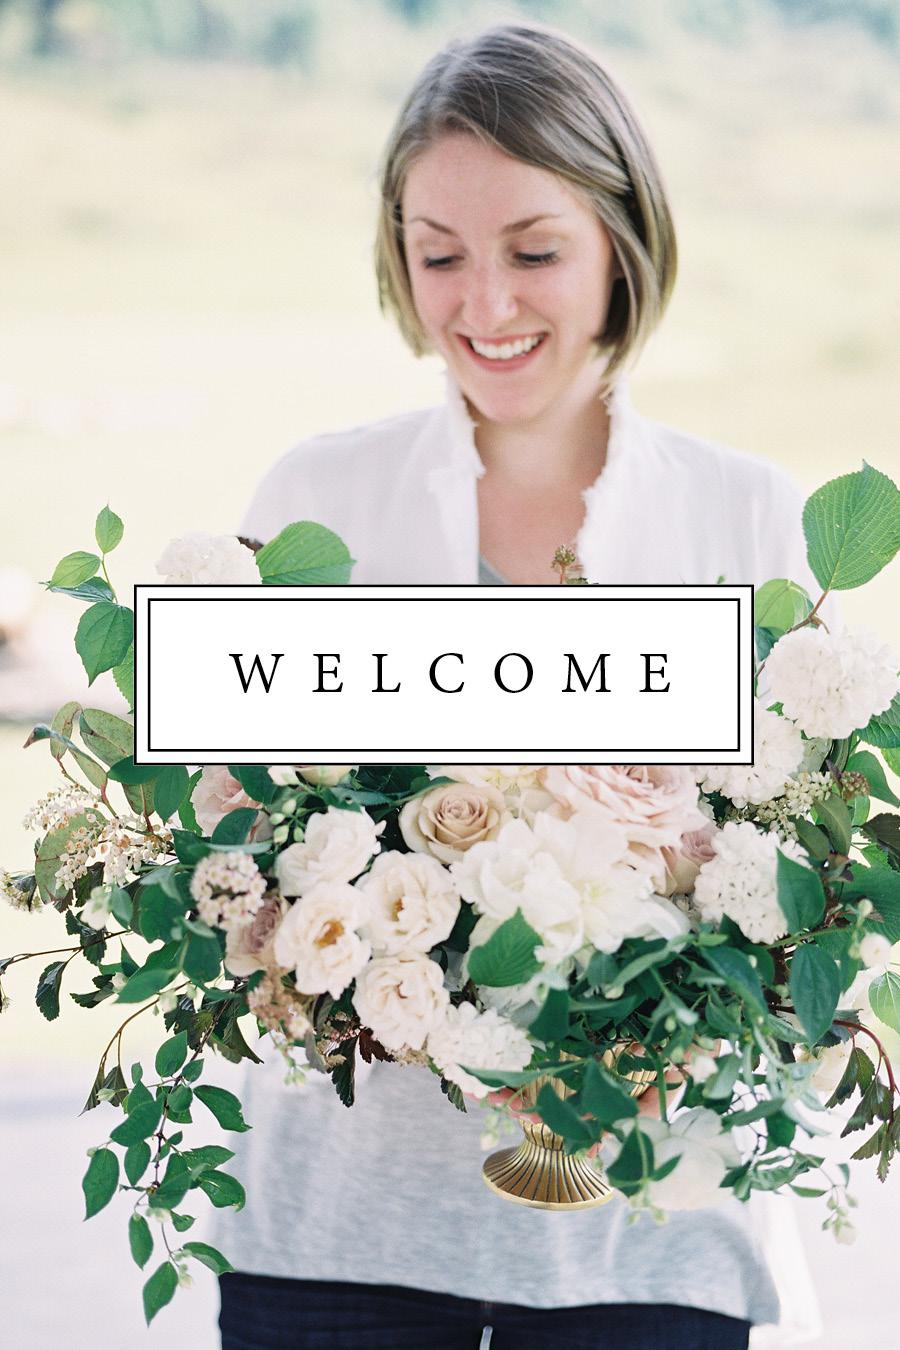 Stone House Creative - Winnipeg Florist Lauren Wiebe